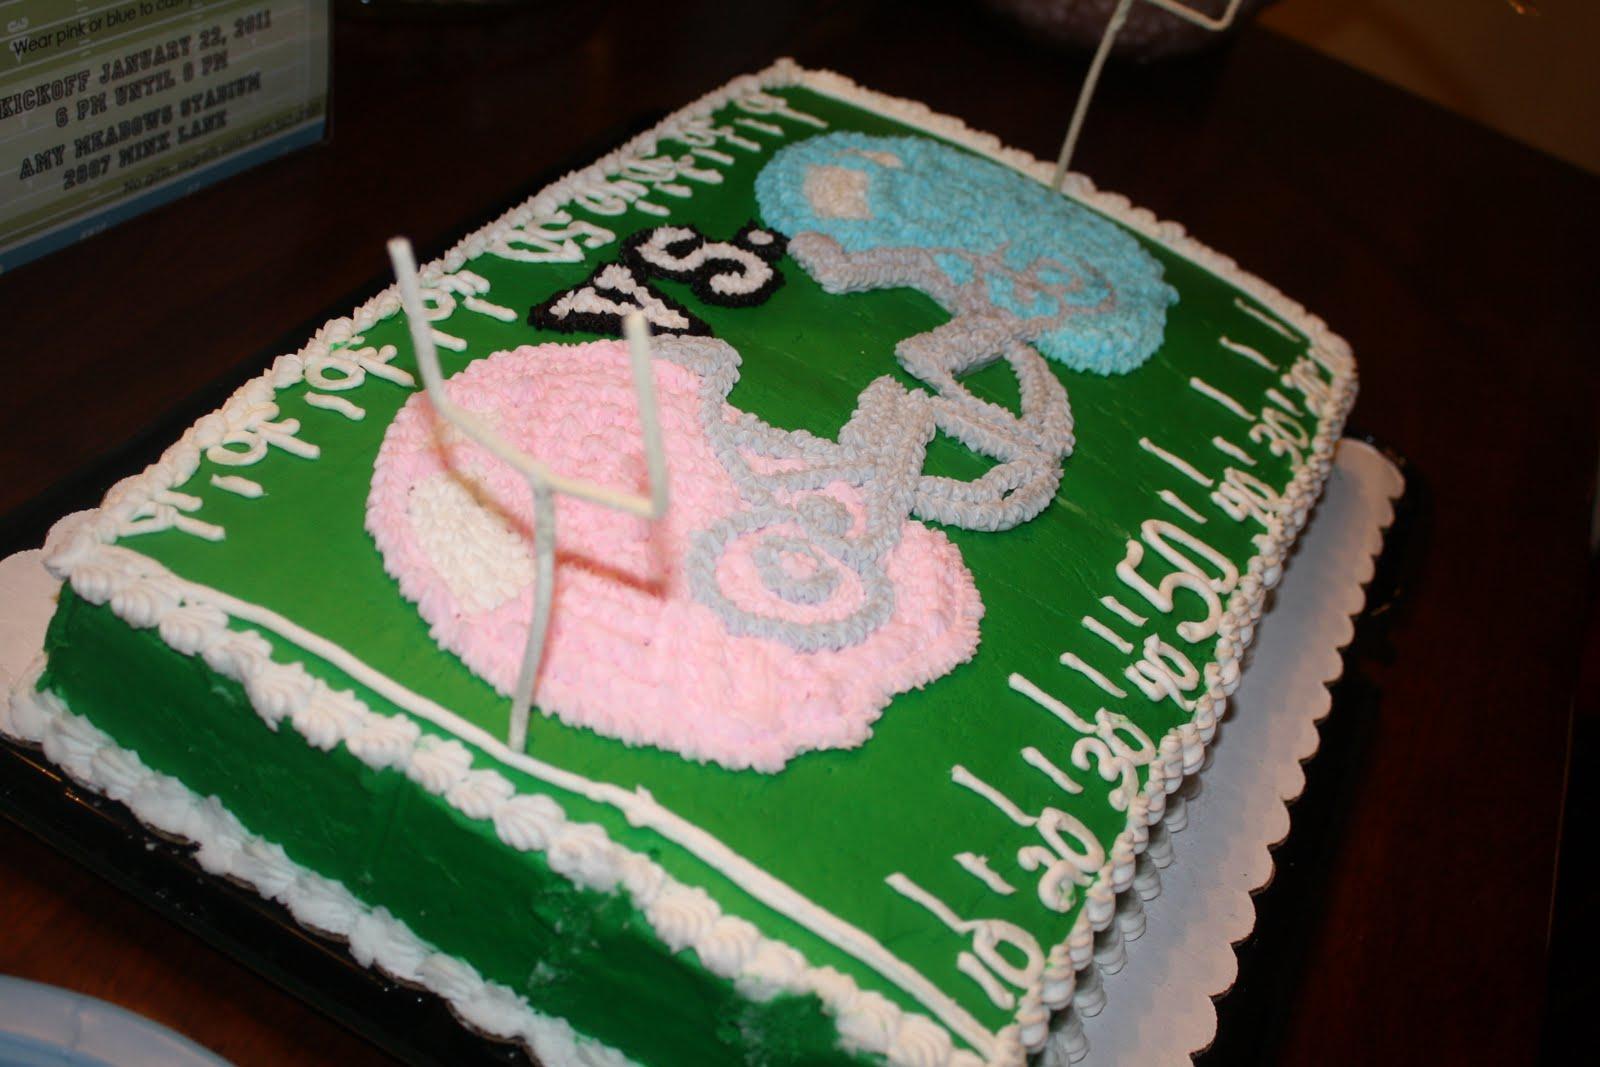 Western Themed Gender Reveal Cake Ideas 57381 Gender Revea